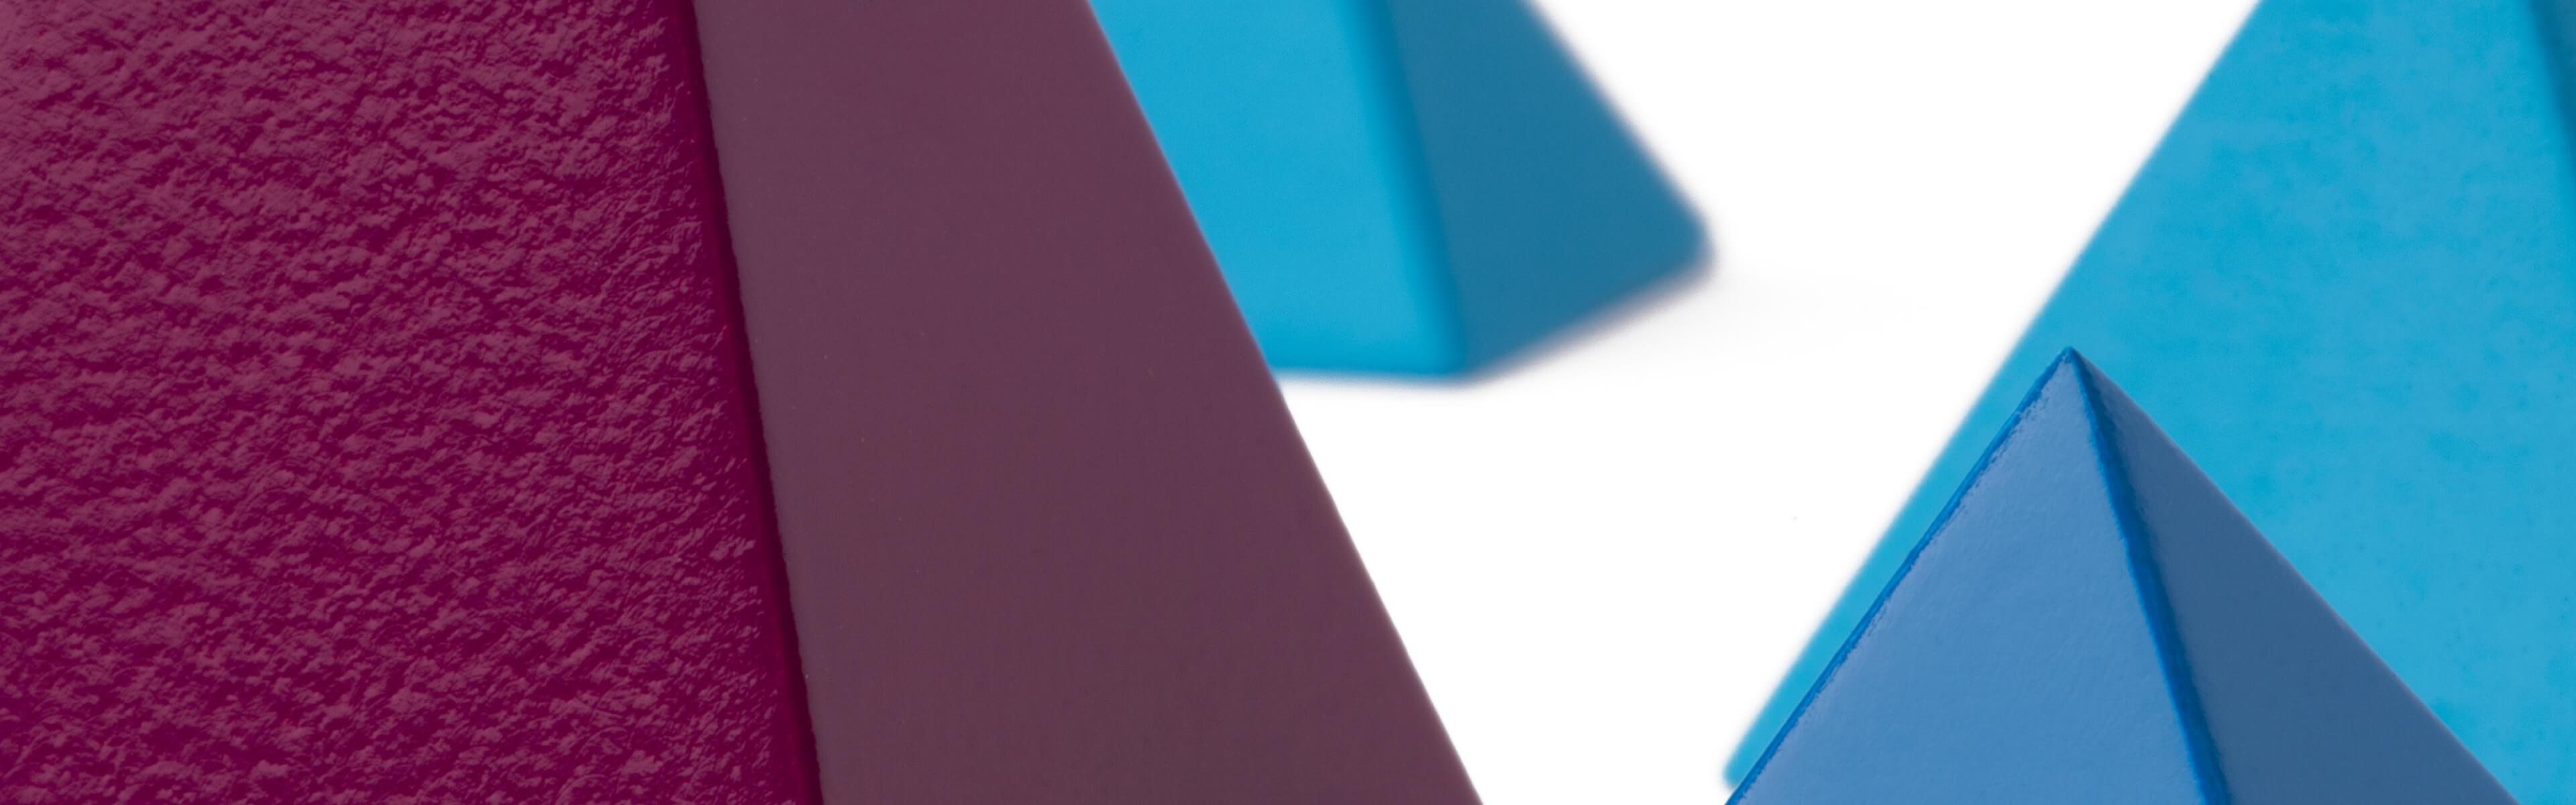 nienhuis-3d-banner-08272018.jpg